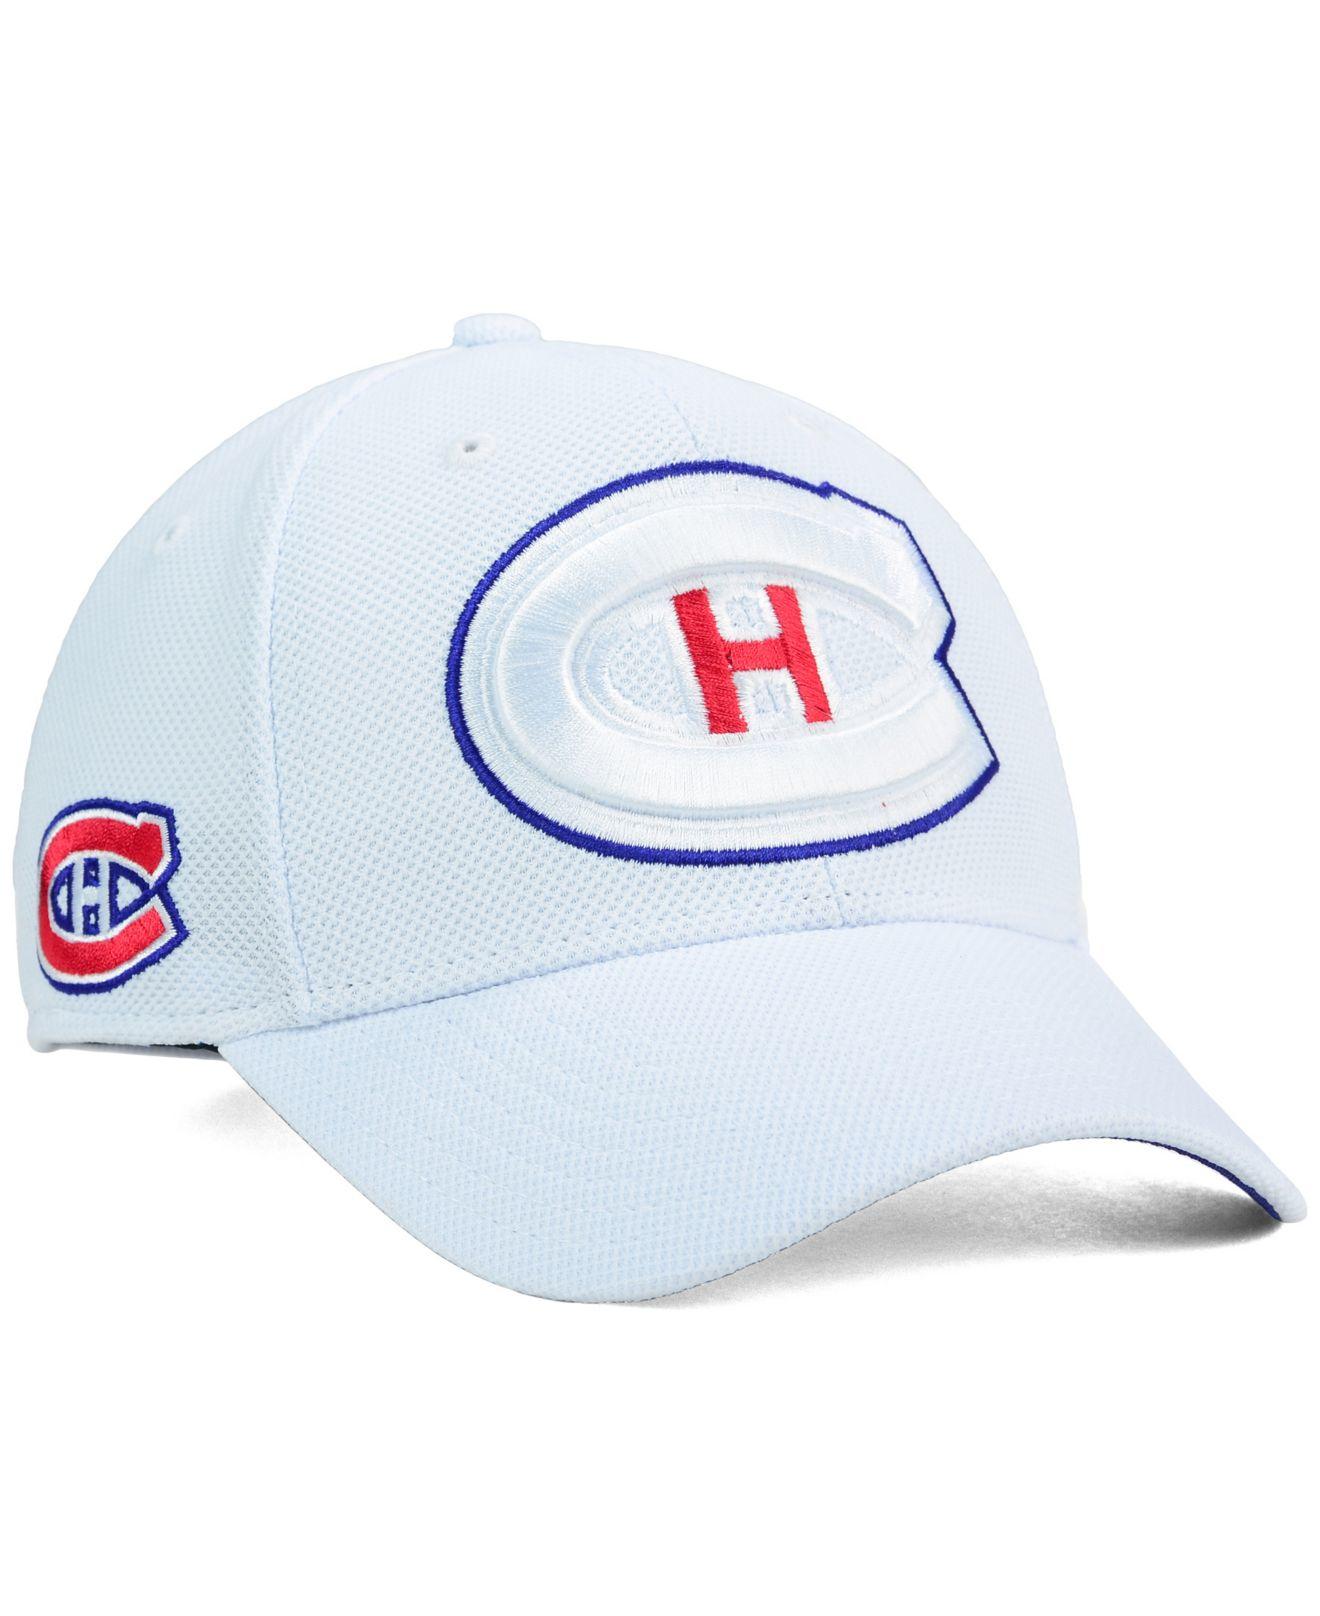 76bd6ffa77f Lyst - Reebok Montreal Canadiens 2nd Season Flex Cap in White for Men